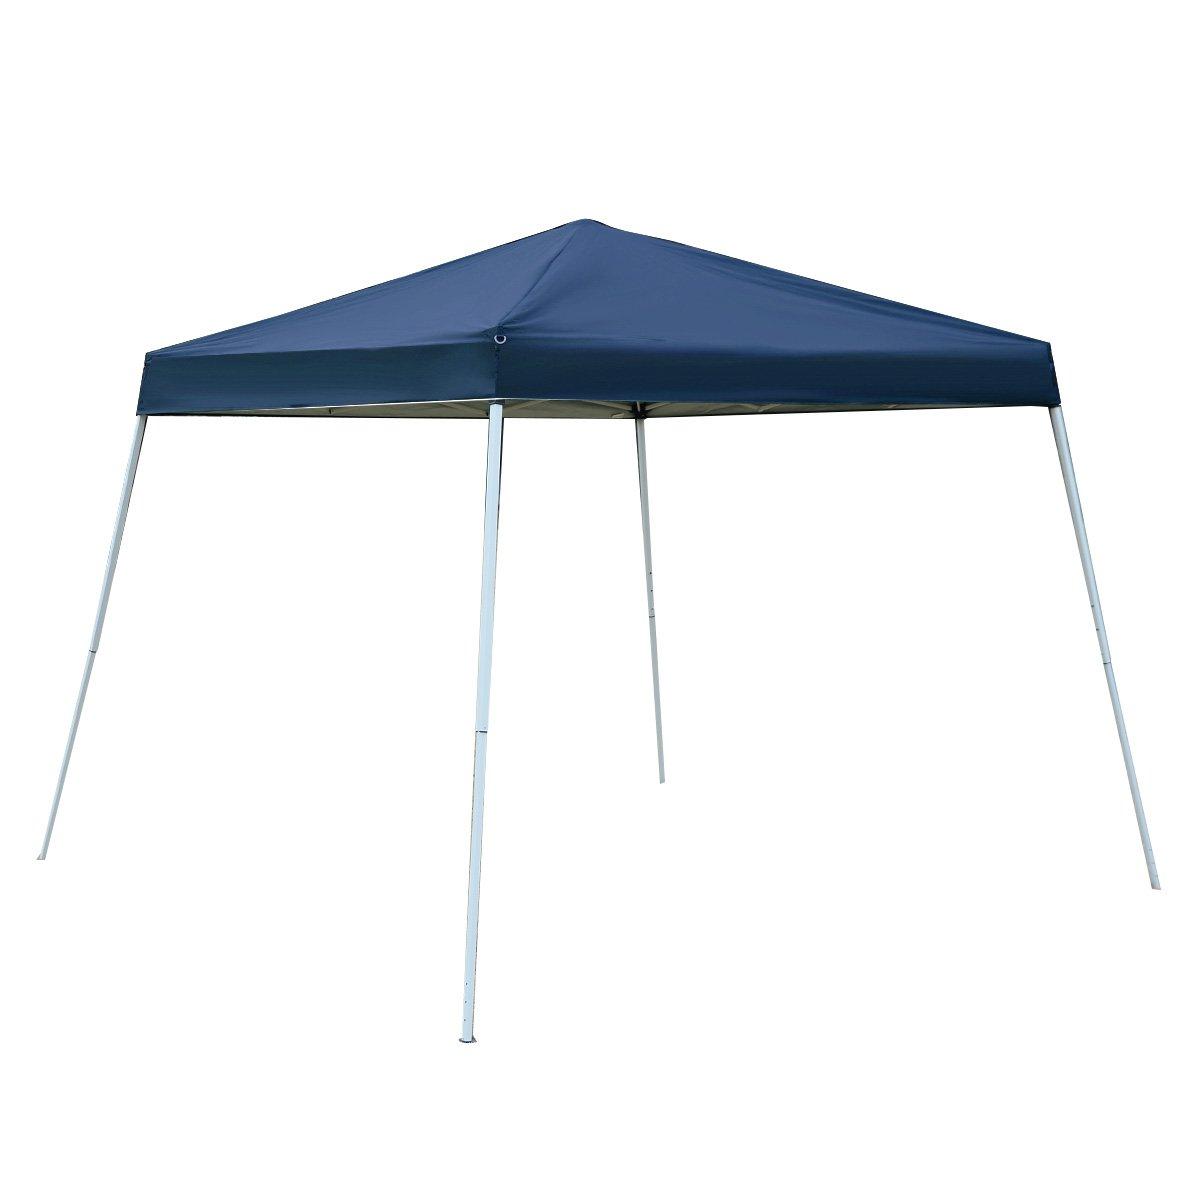 Amazon.com  Tangkula 10u0027X10u0027 EZ POP UP Tent Gazebo Wedding Party Canopy Shelter Carry Bag (Blue)  Sports u0026 Outdoors  sc 1 st  Amazon.com & Amazon.com : Tangkula 10u0027X10u0027 EZ POP UP Tent Gazebo Wedding Party ...